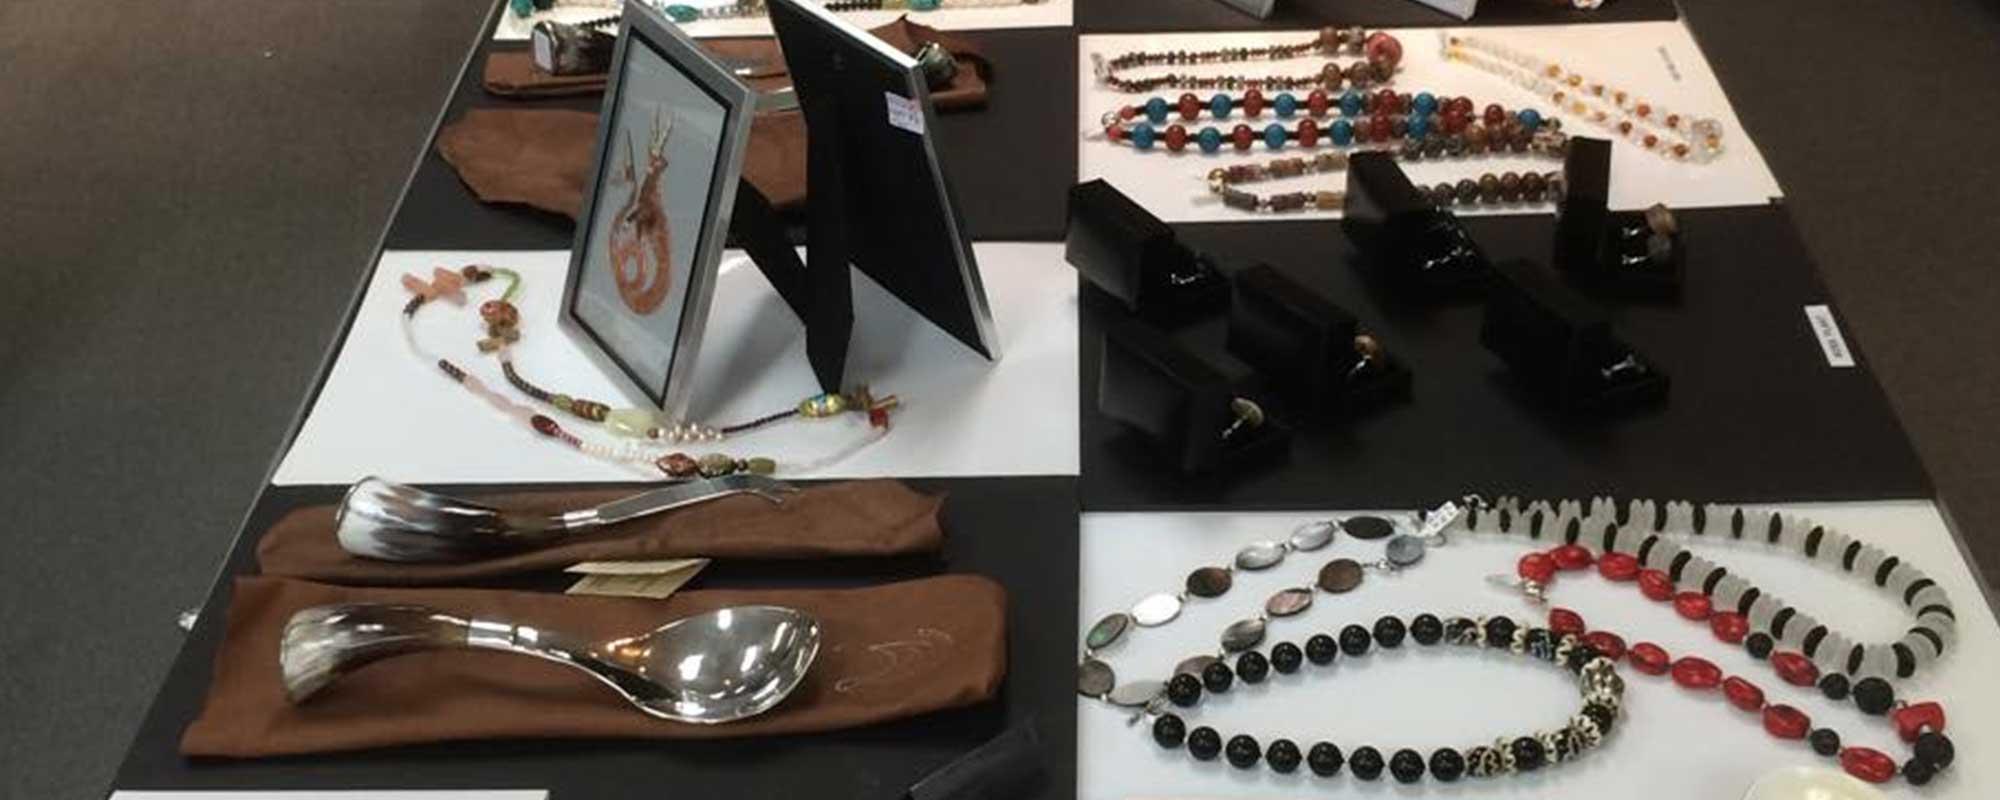 Variety of Jewellery